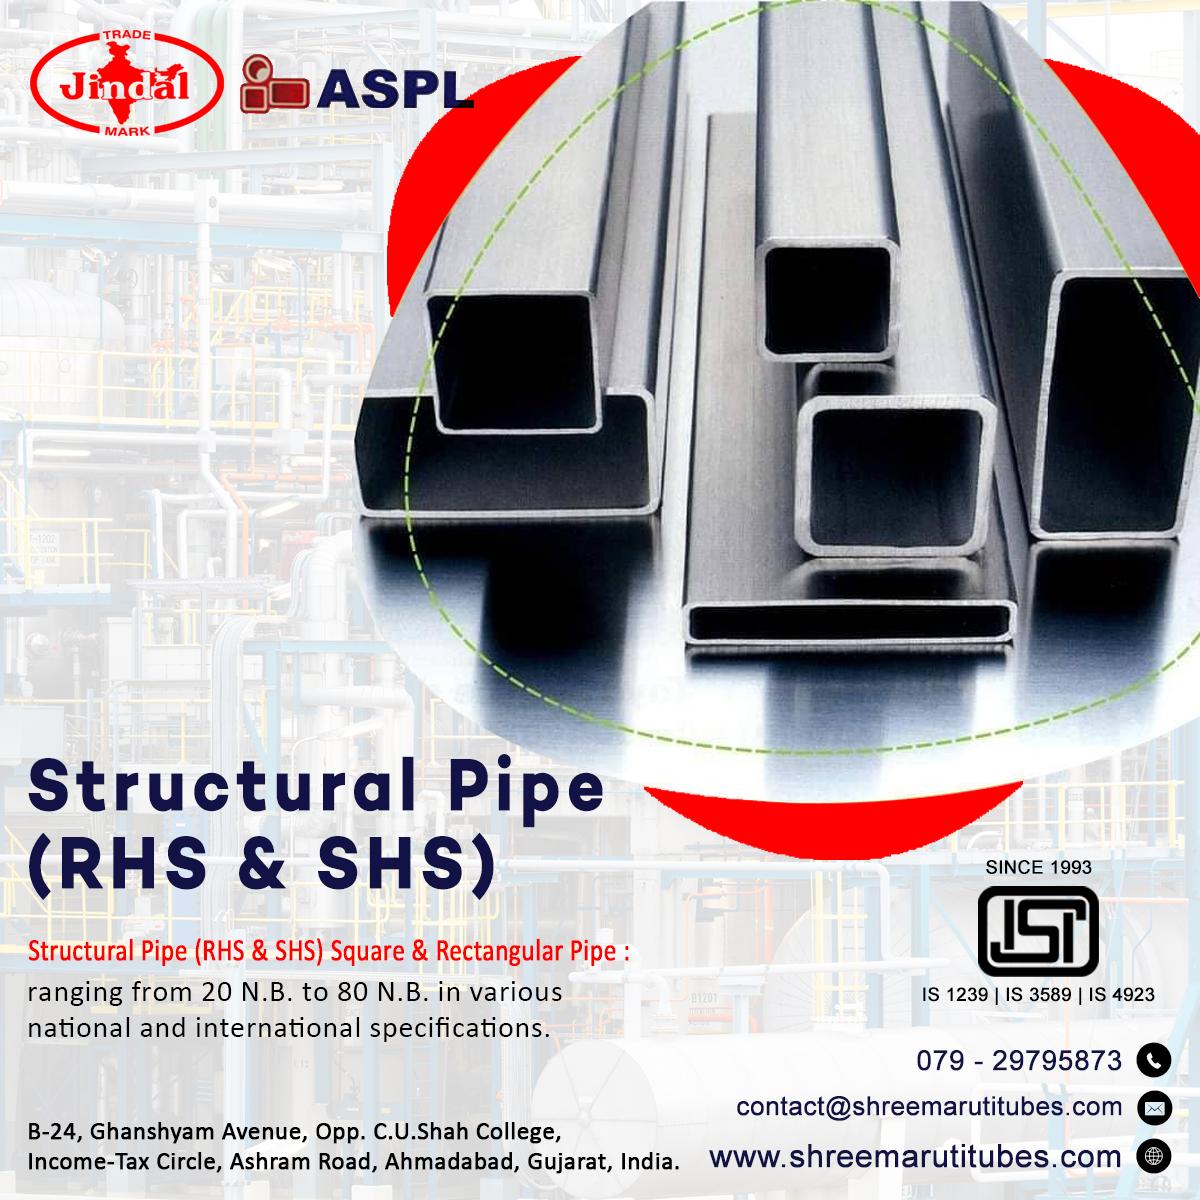 Structural Pipe (RHS & SHS) Square & Rectangular Pipe : ranging from 20 N.B. to 80 N.B. in various national and international specifications. #structuralpipe #rhs #shs #squarepipe #rectangularpipe #is1239 #is3589 #is4923 #hollowsectionpipe #shreemarutitubes https://t.co/n5oJ9QdmIx